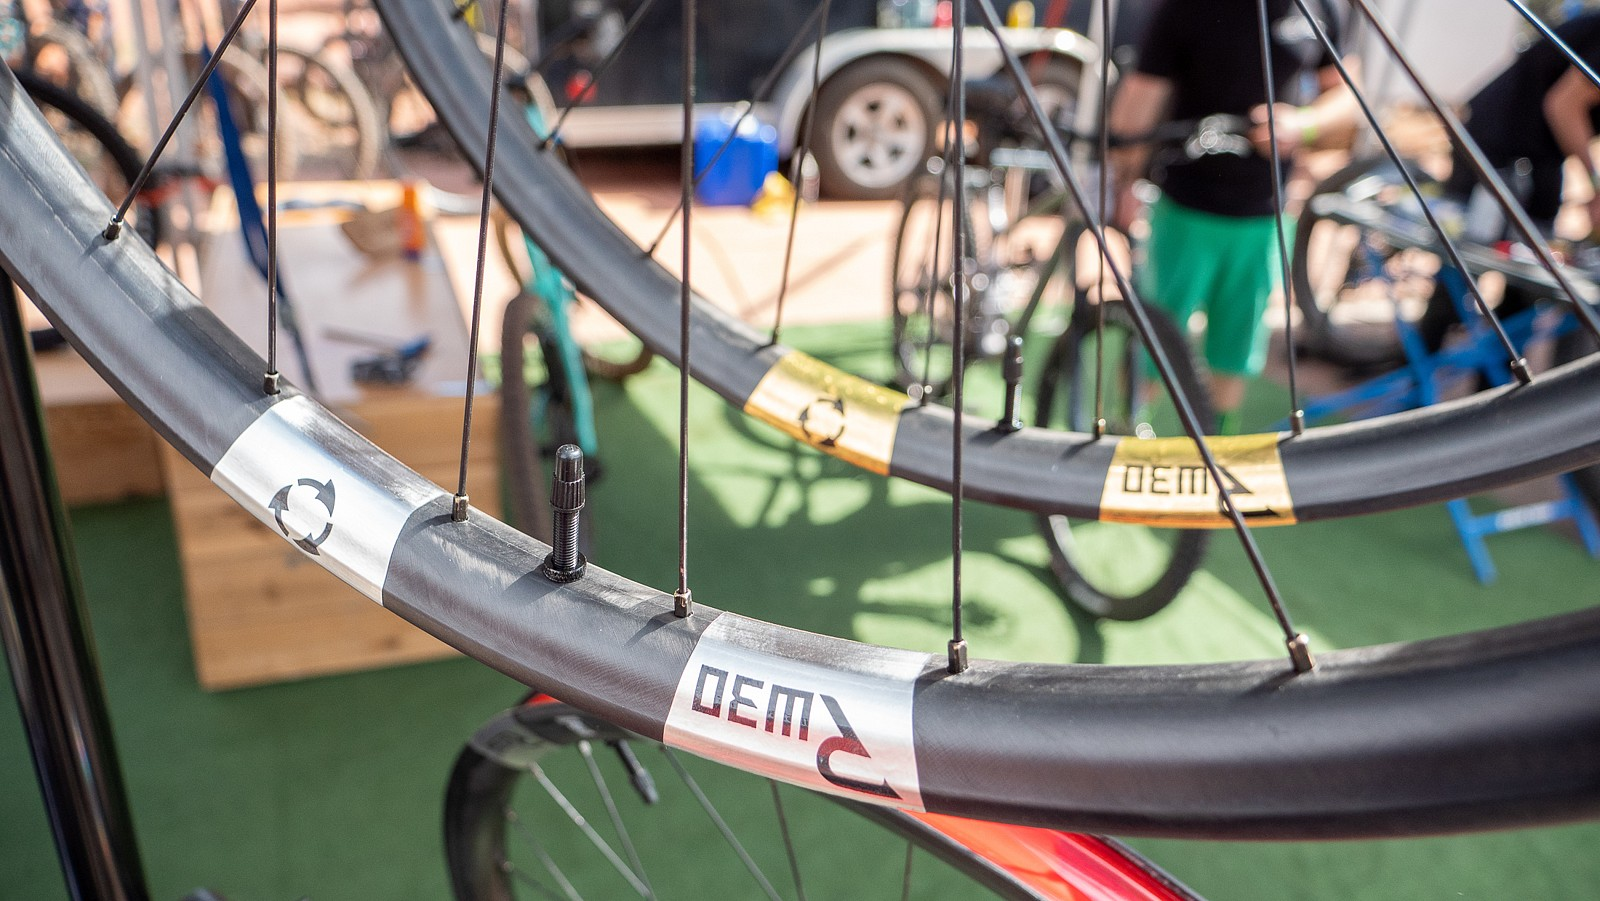 New Revel Recyclable Wheels - PIT BITS 2 - Sedona Bike Festival 2020 - Mountain Biking Pictures - Vital MTB